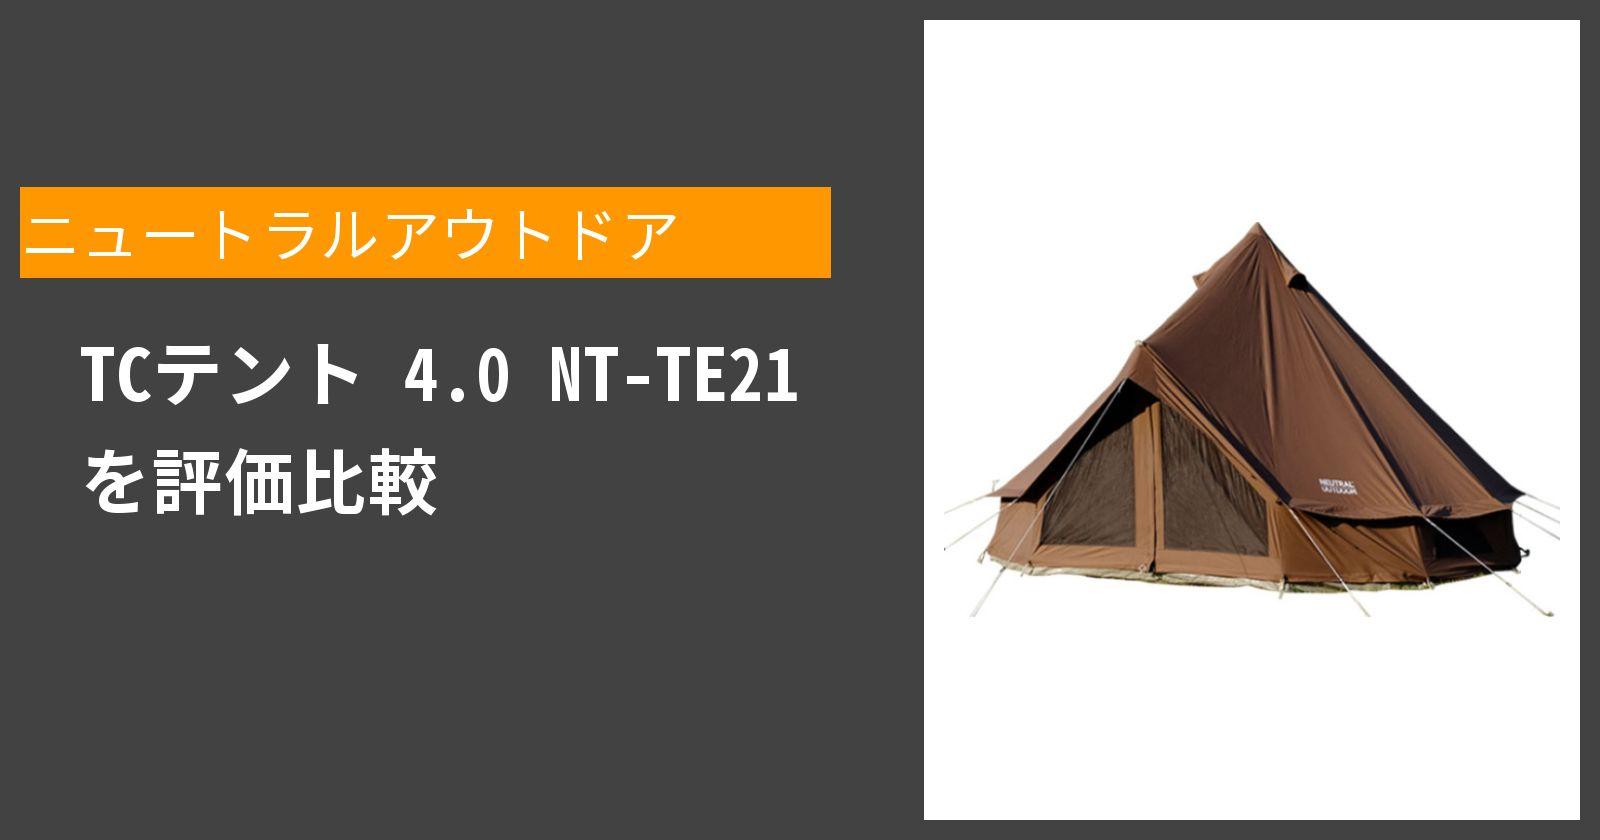 TCテント 4.0 NT-TE21を徹底評価